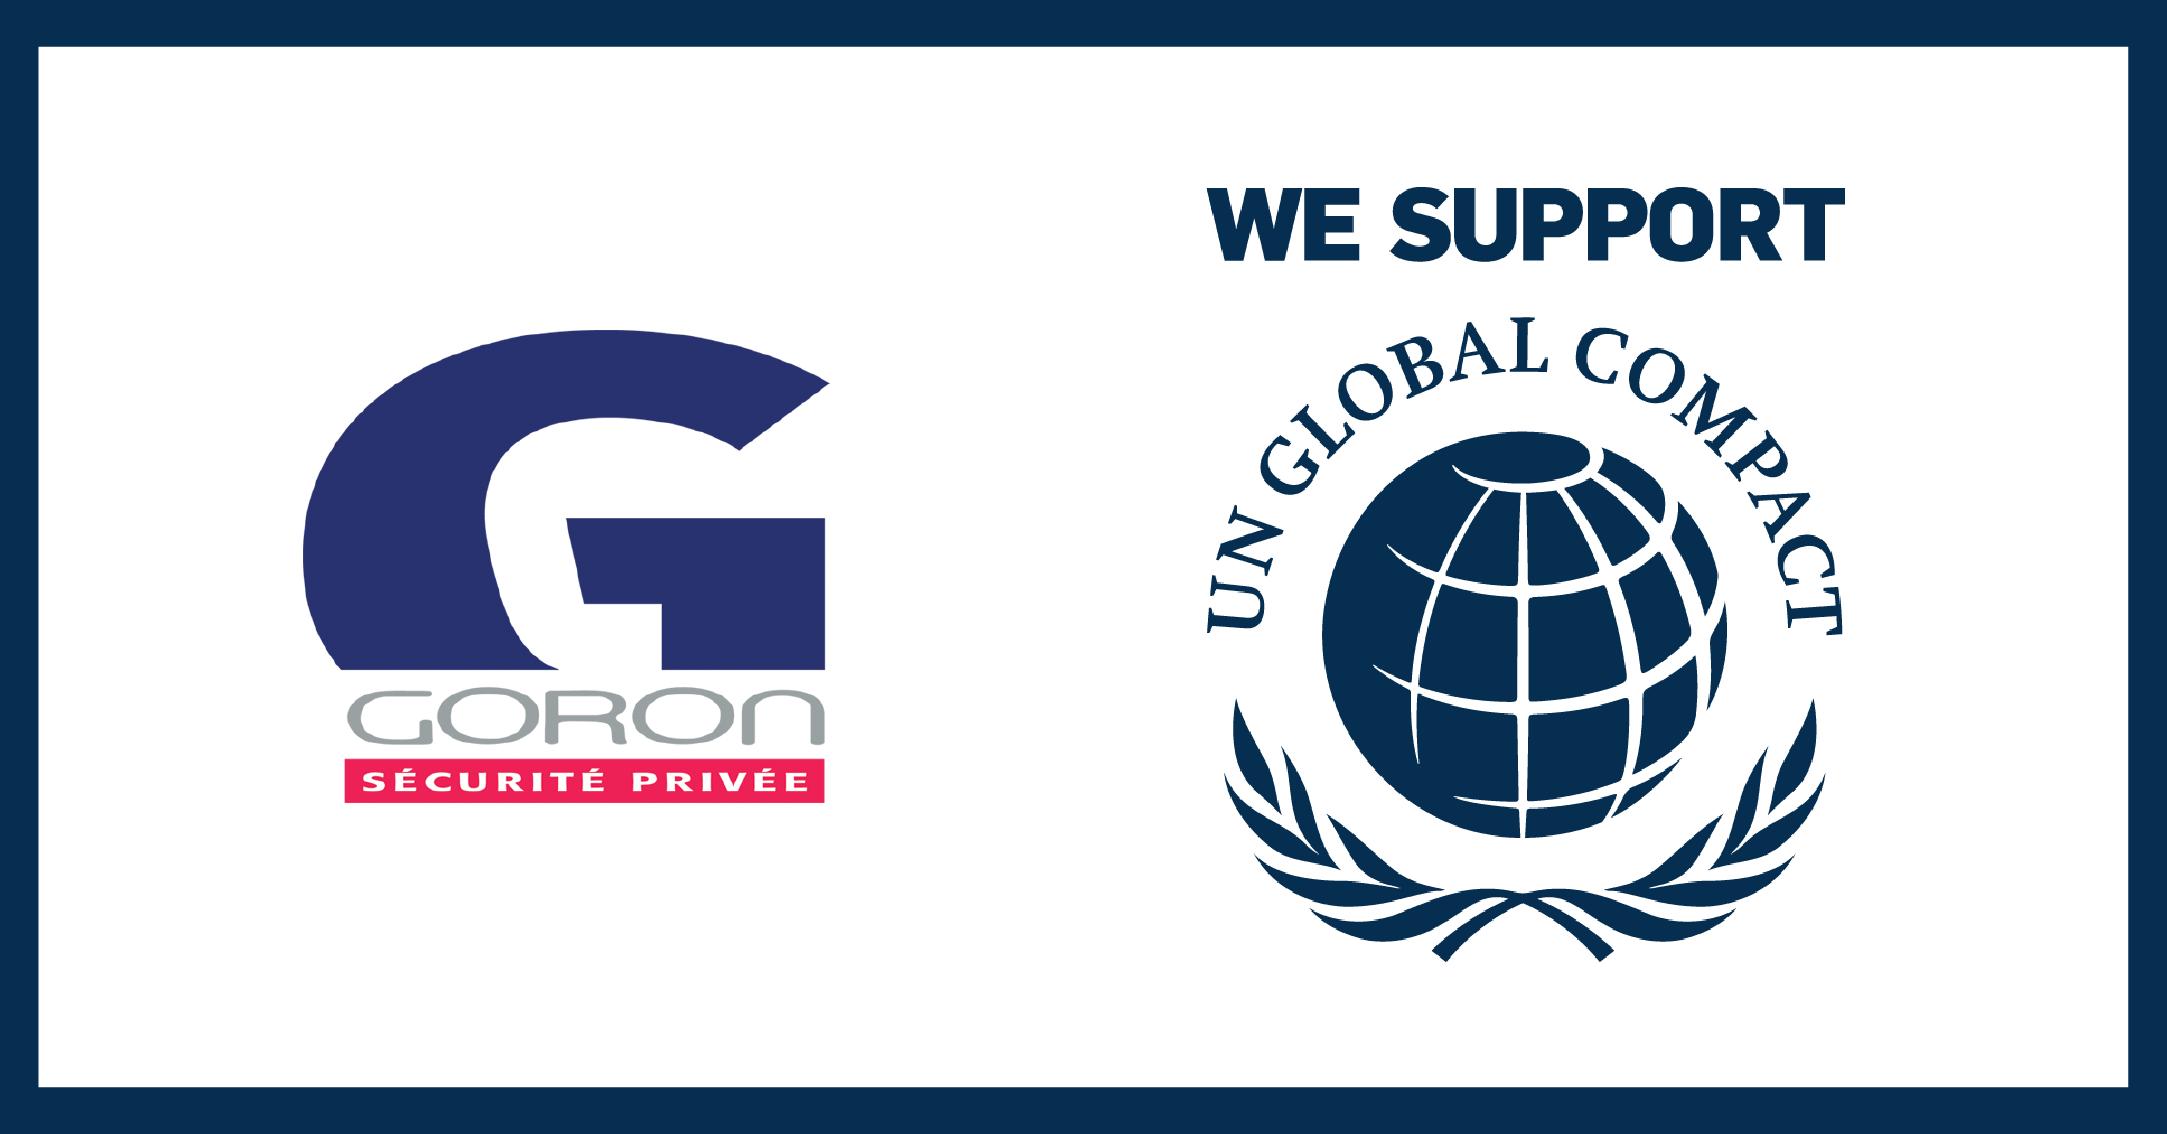 Goron adhère au Global Compact de l'ONU